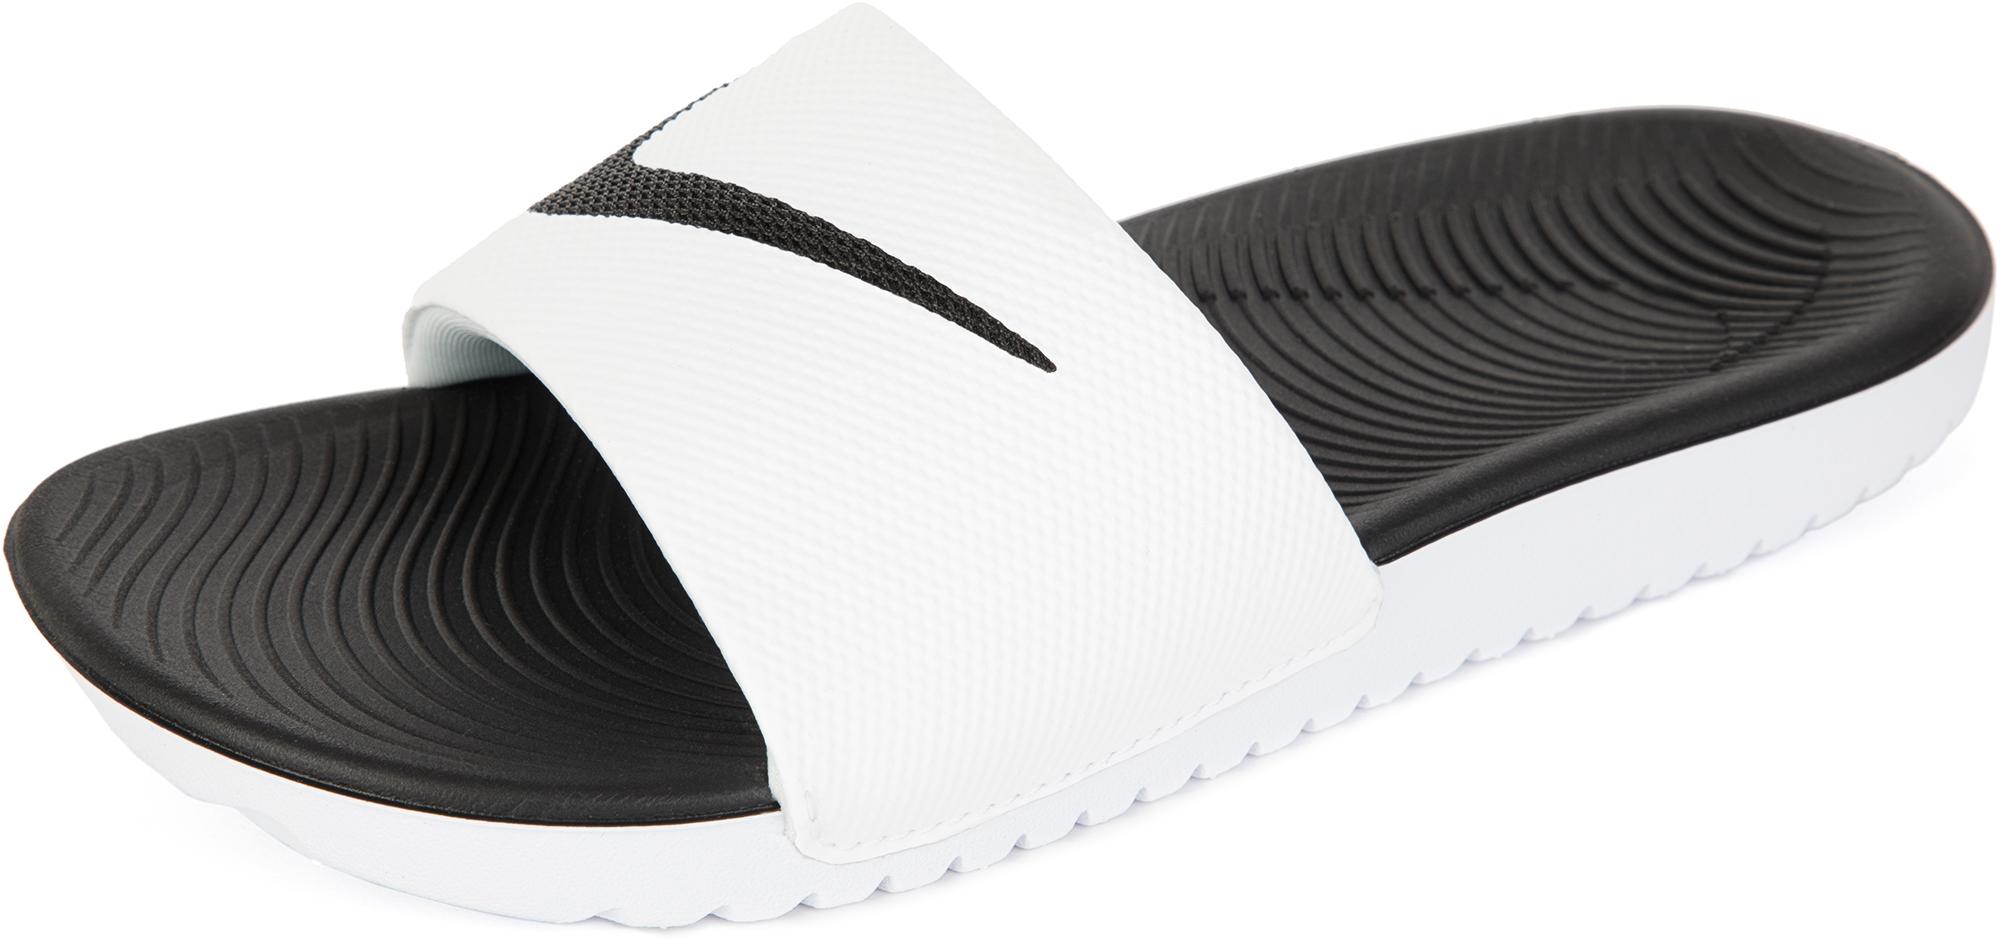 Nike Шлепанцы детские Nike Kawa Slide, размер 34 цена